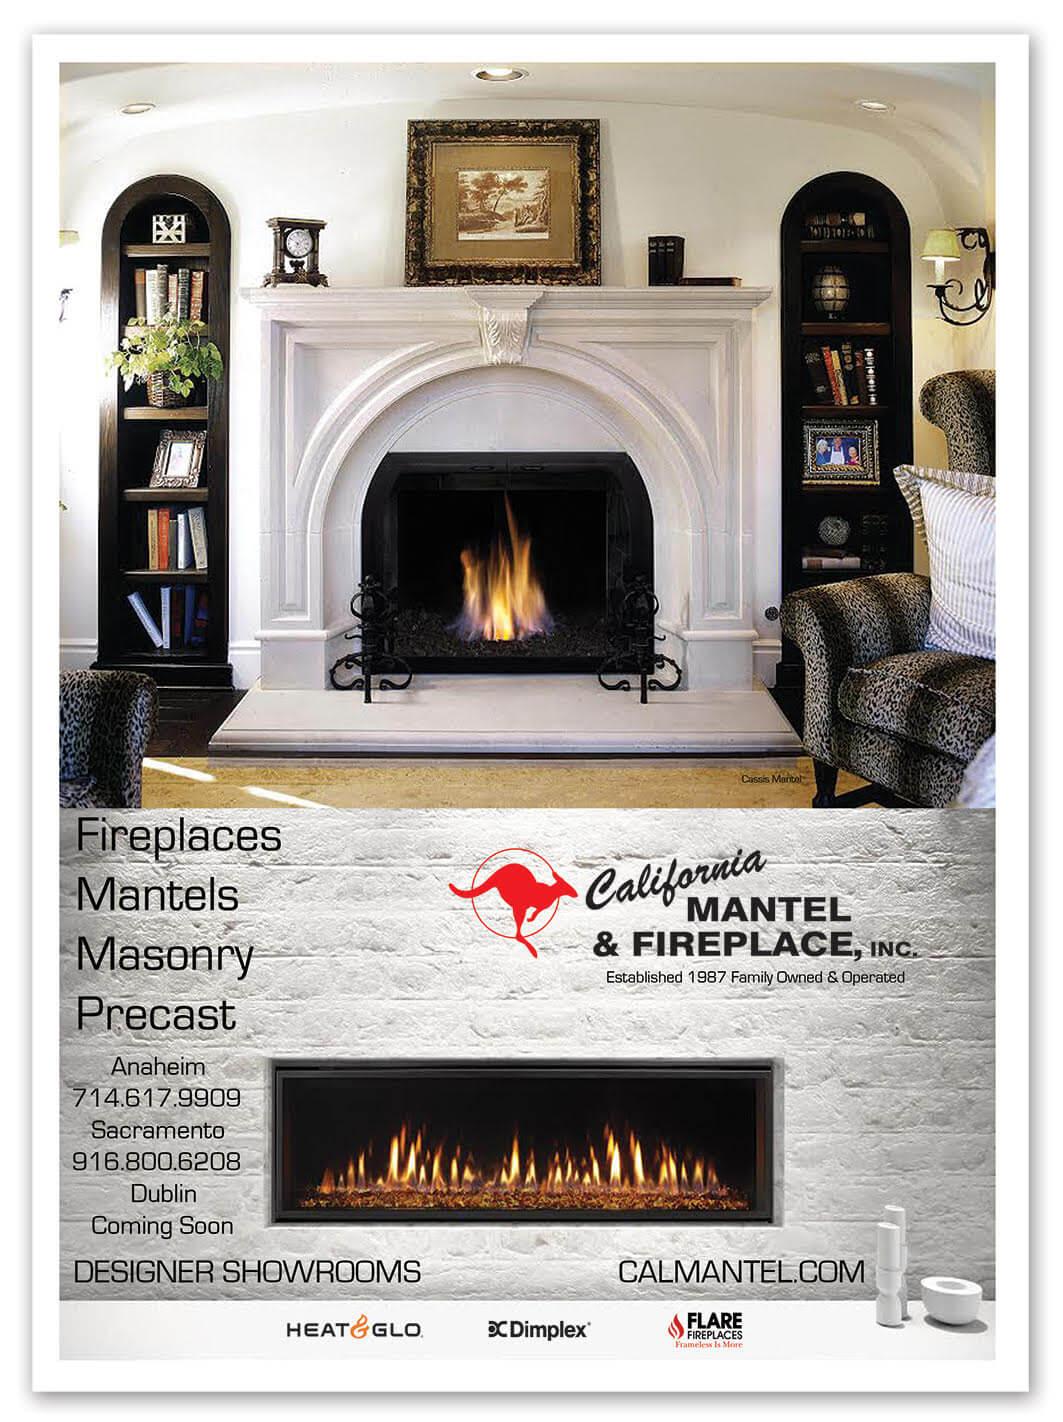 Isokern Fireplace